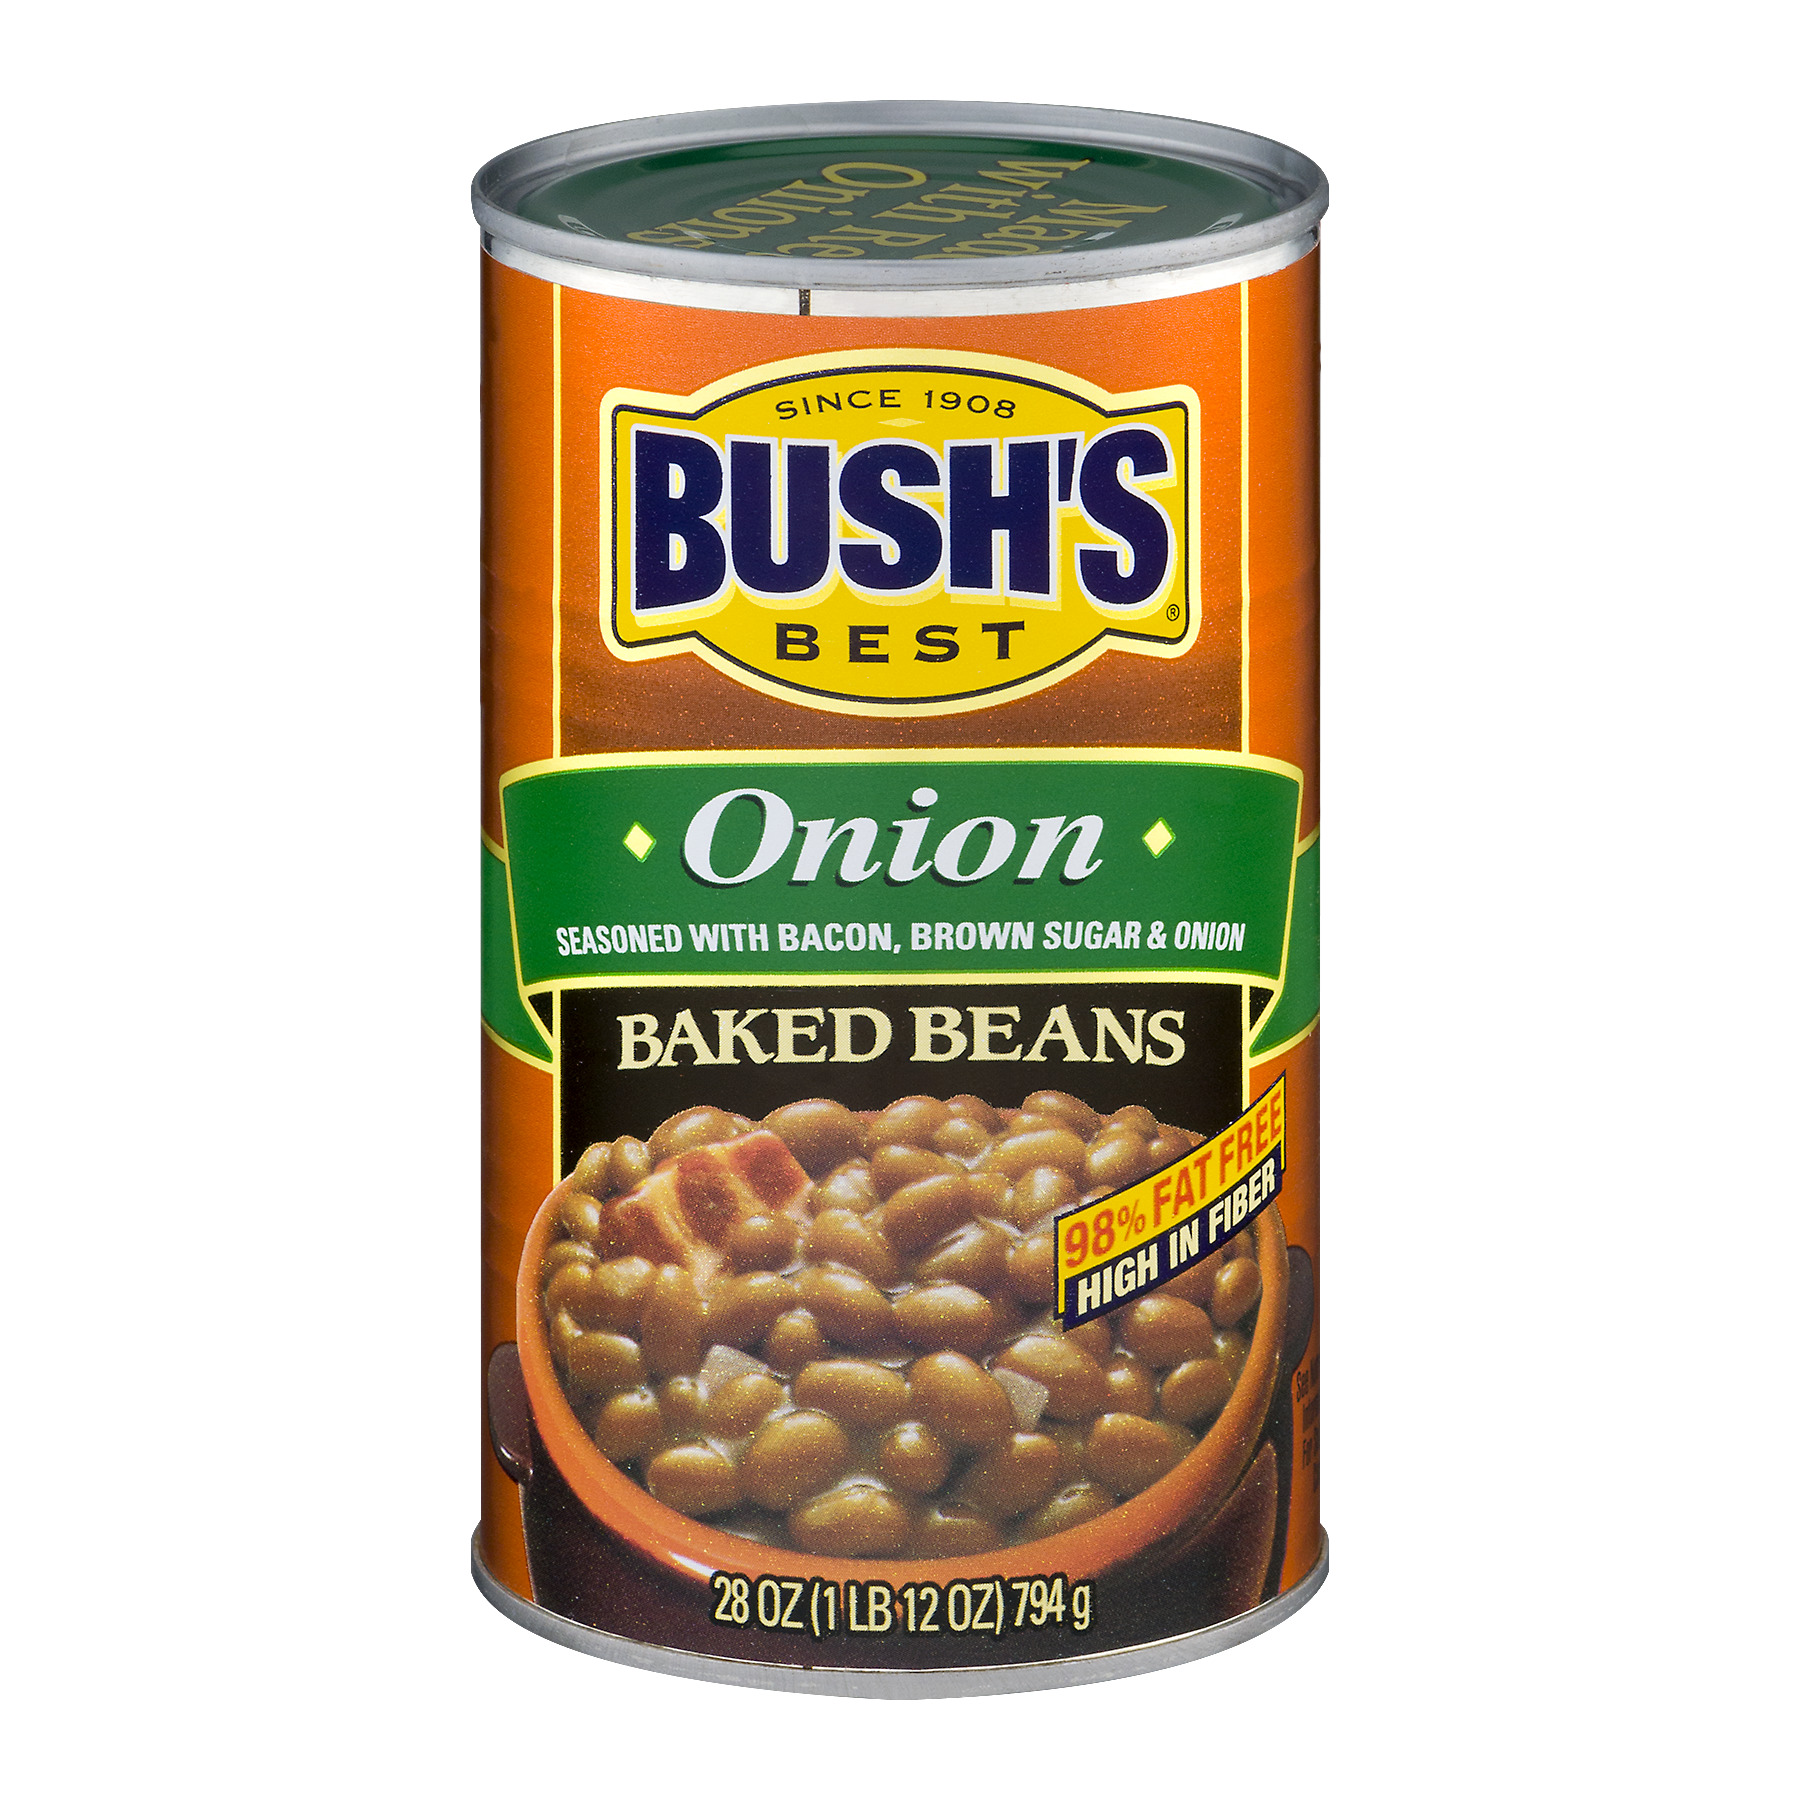 (4 Pack) Bush's Best Onion Baked Beans, 28 Oz